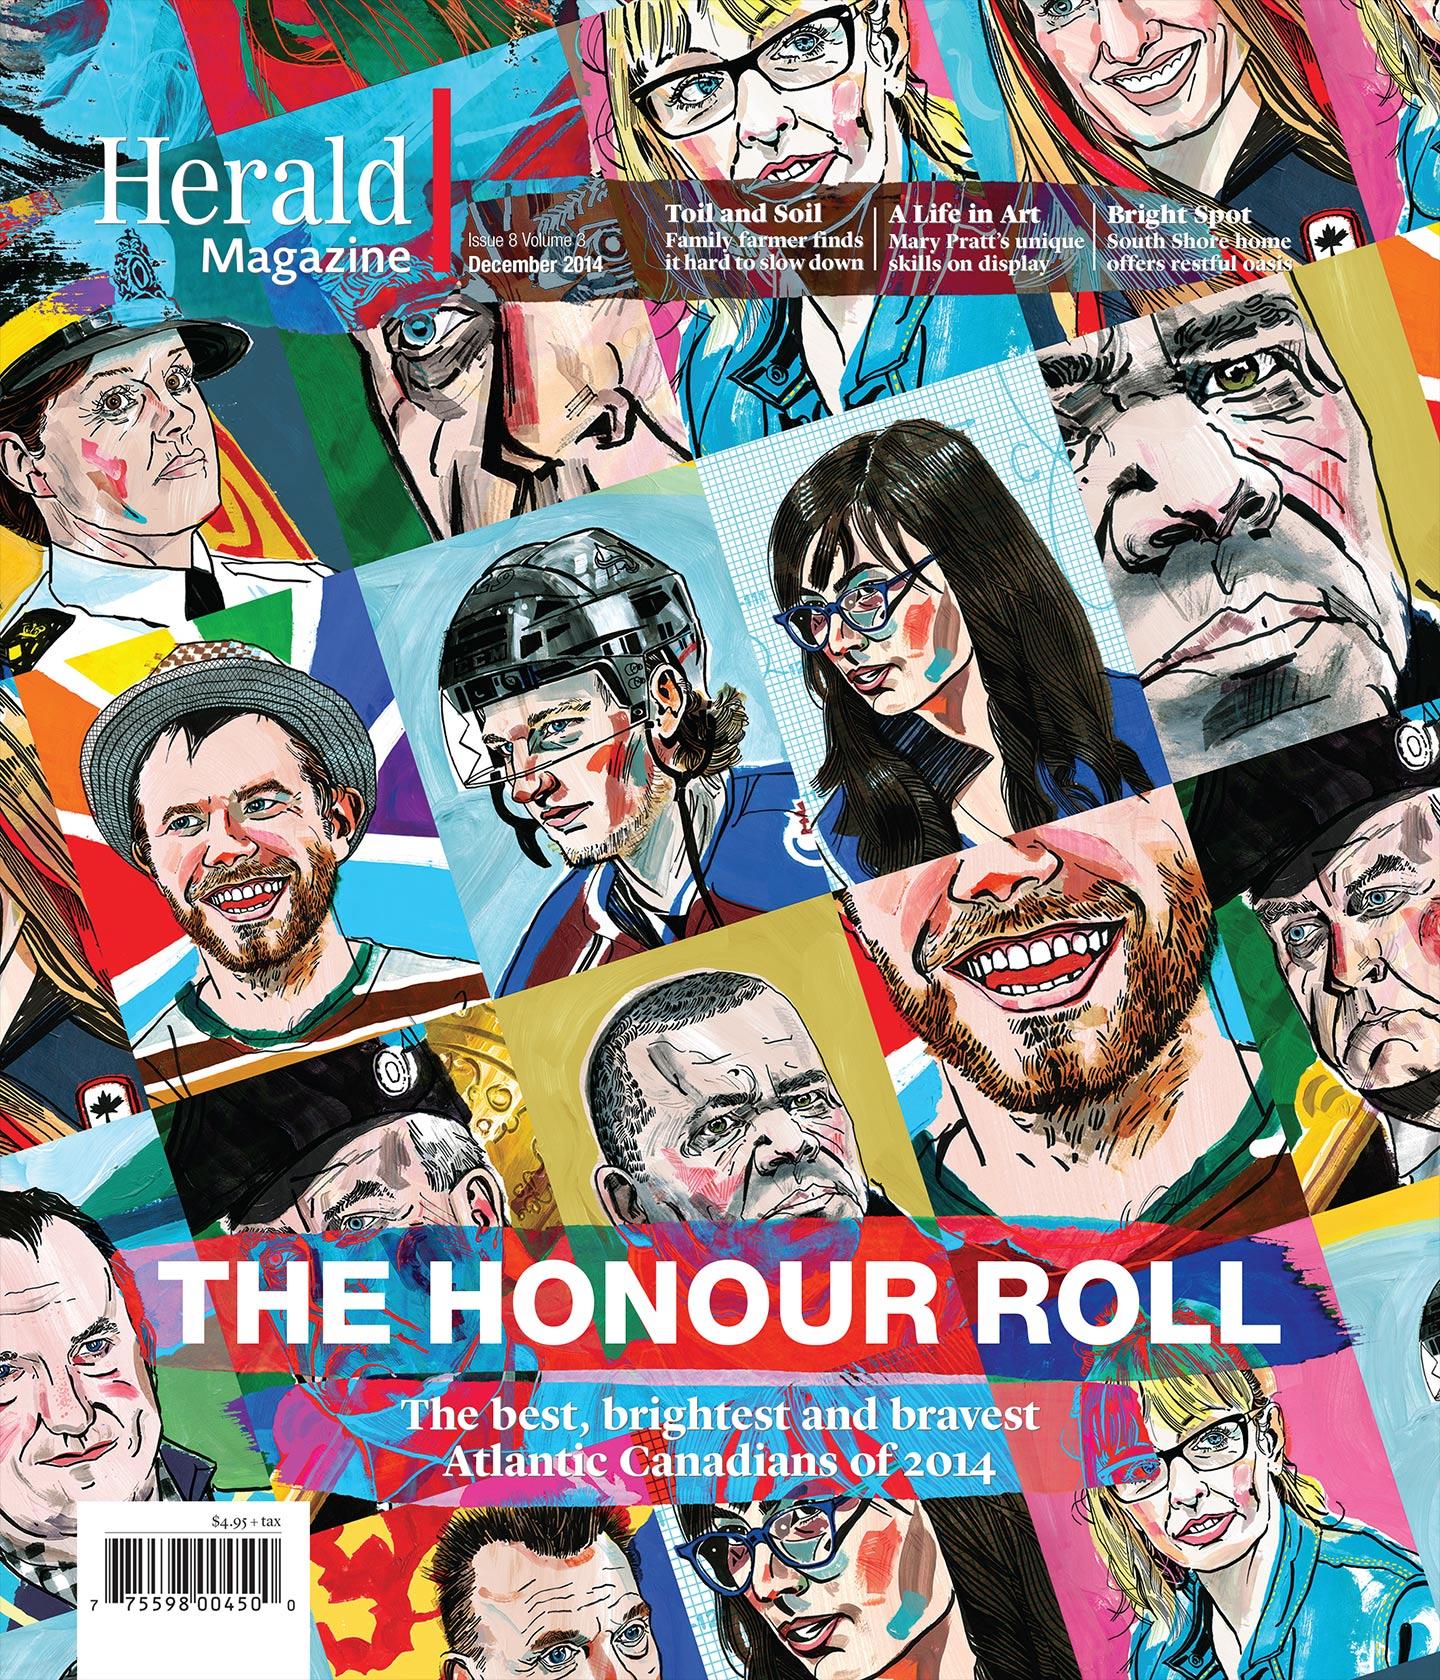 Cover art december issue.